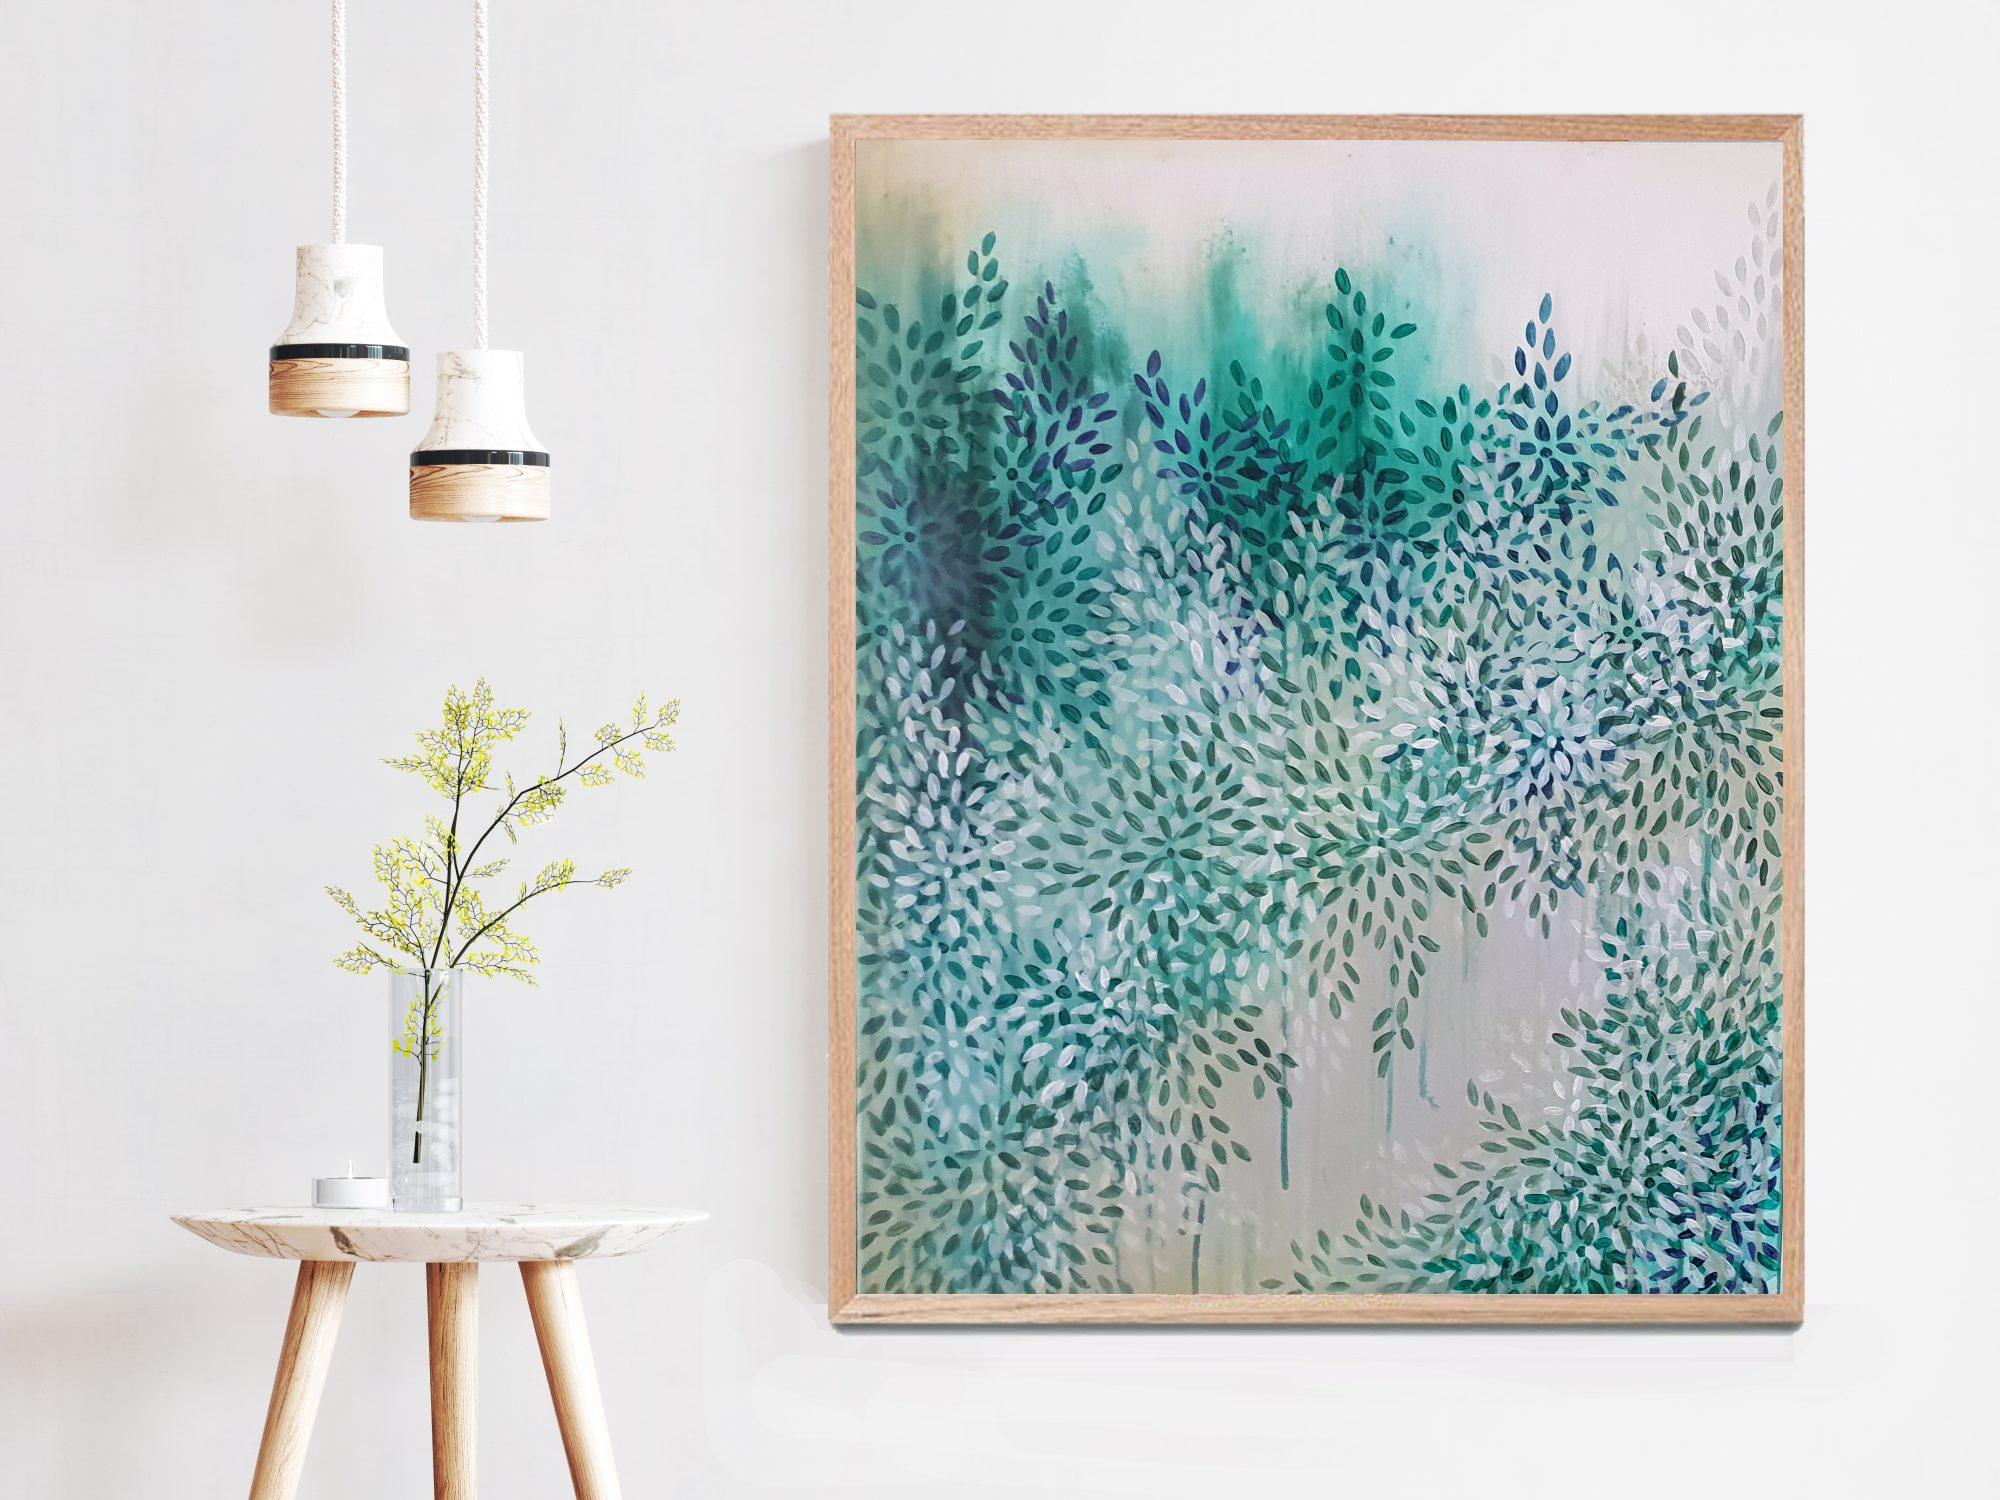 Artist Leni Kae Healing Path By The Greenway Left Wood Frame